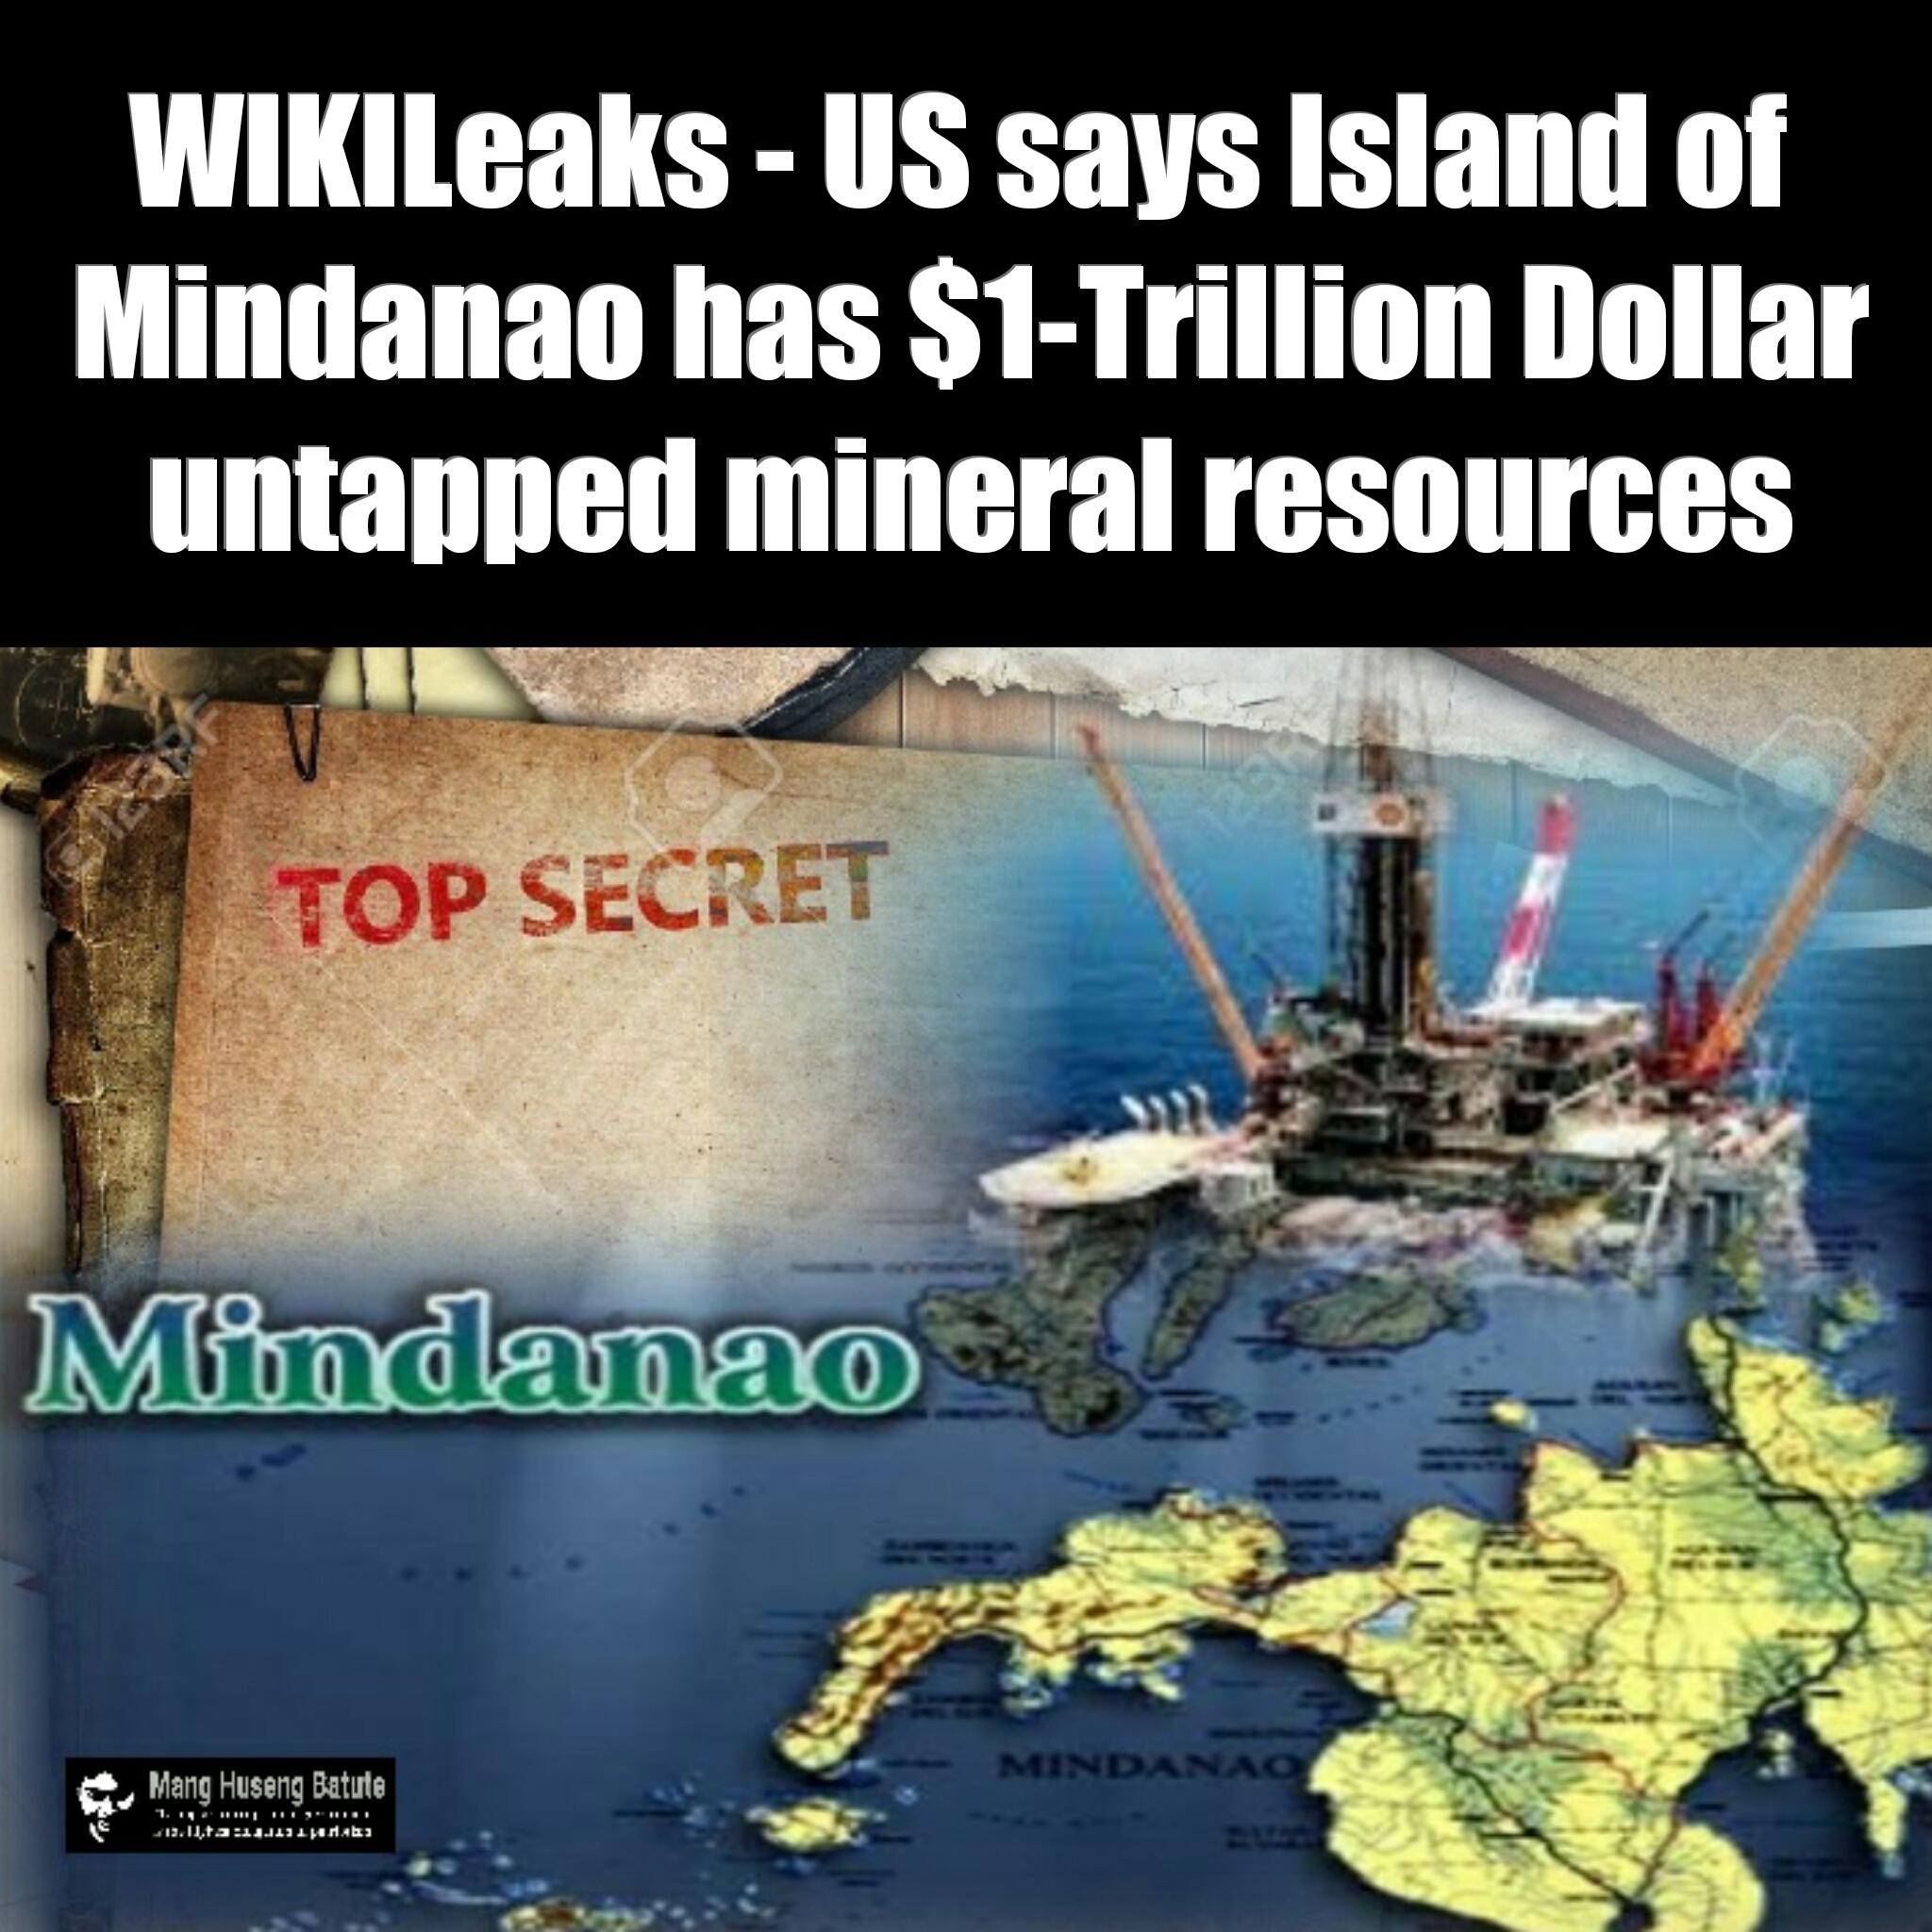 wikileaks us says island mindanao has 1 trillion dollar